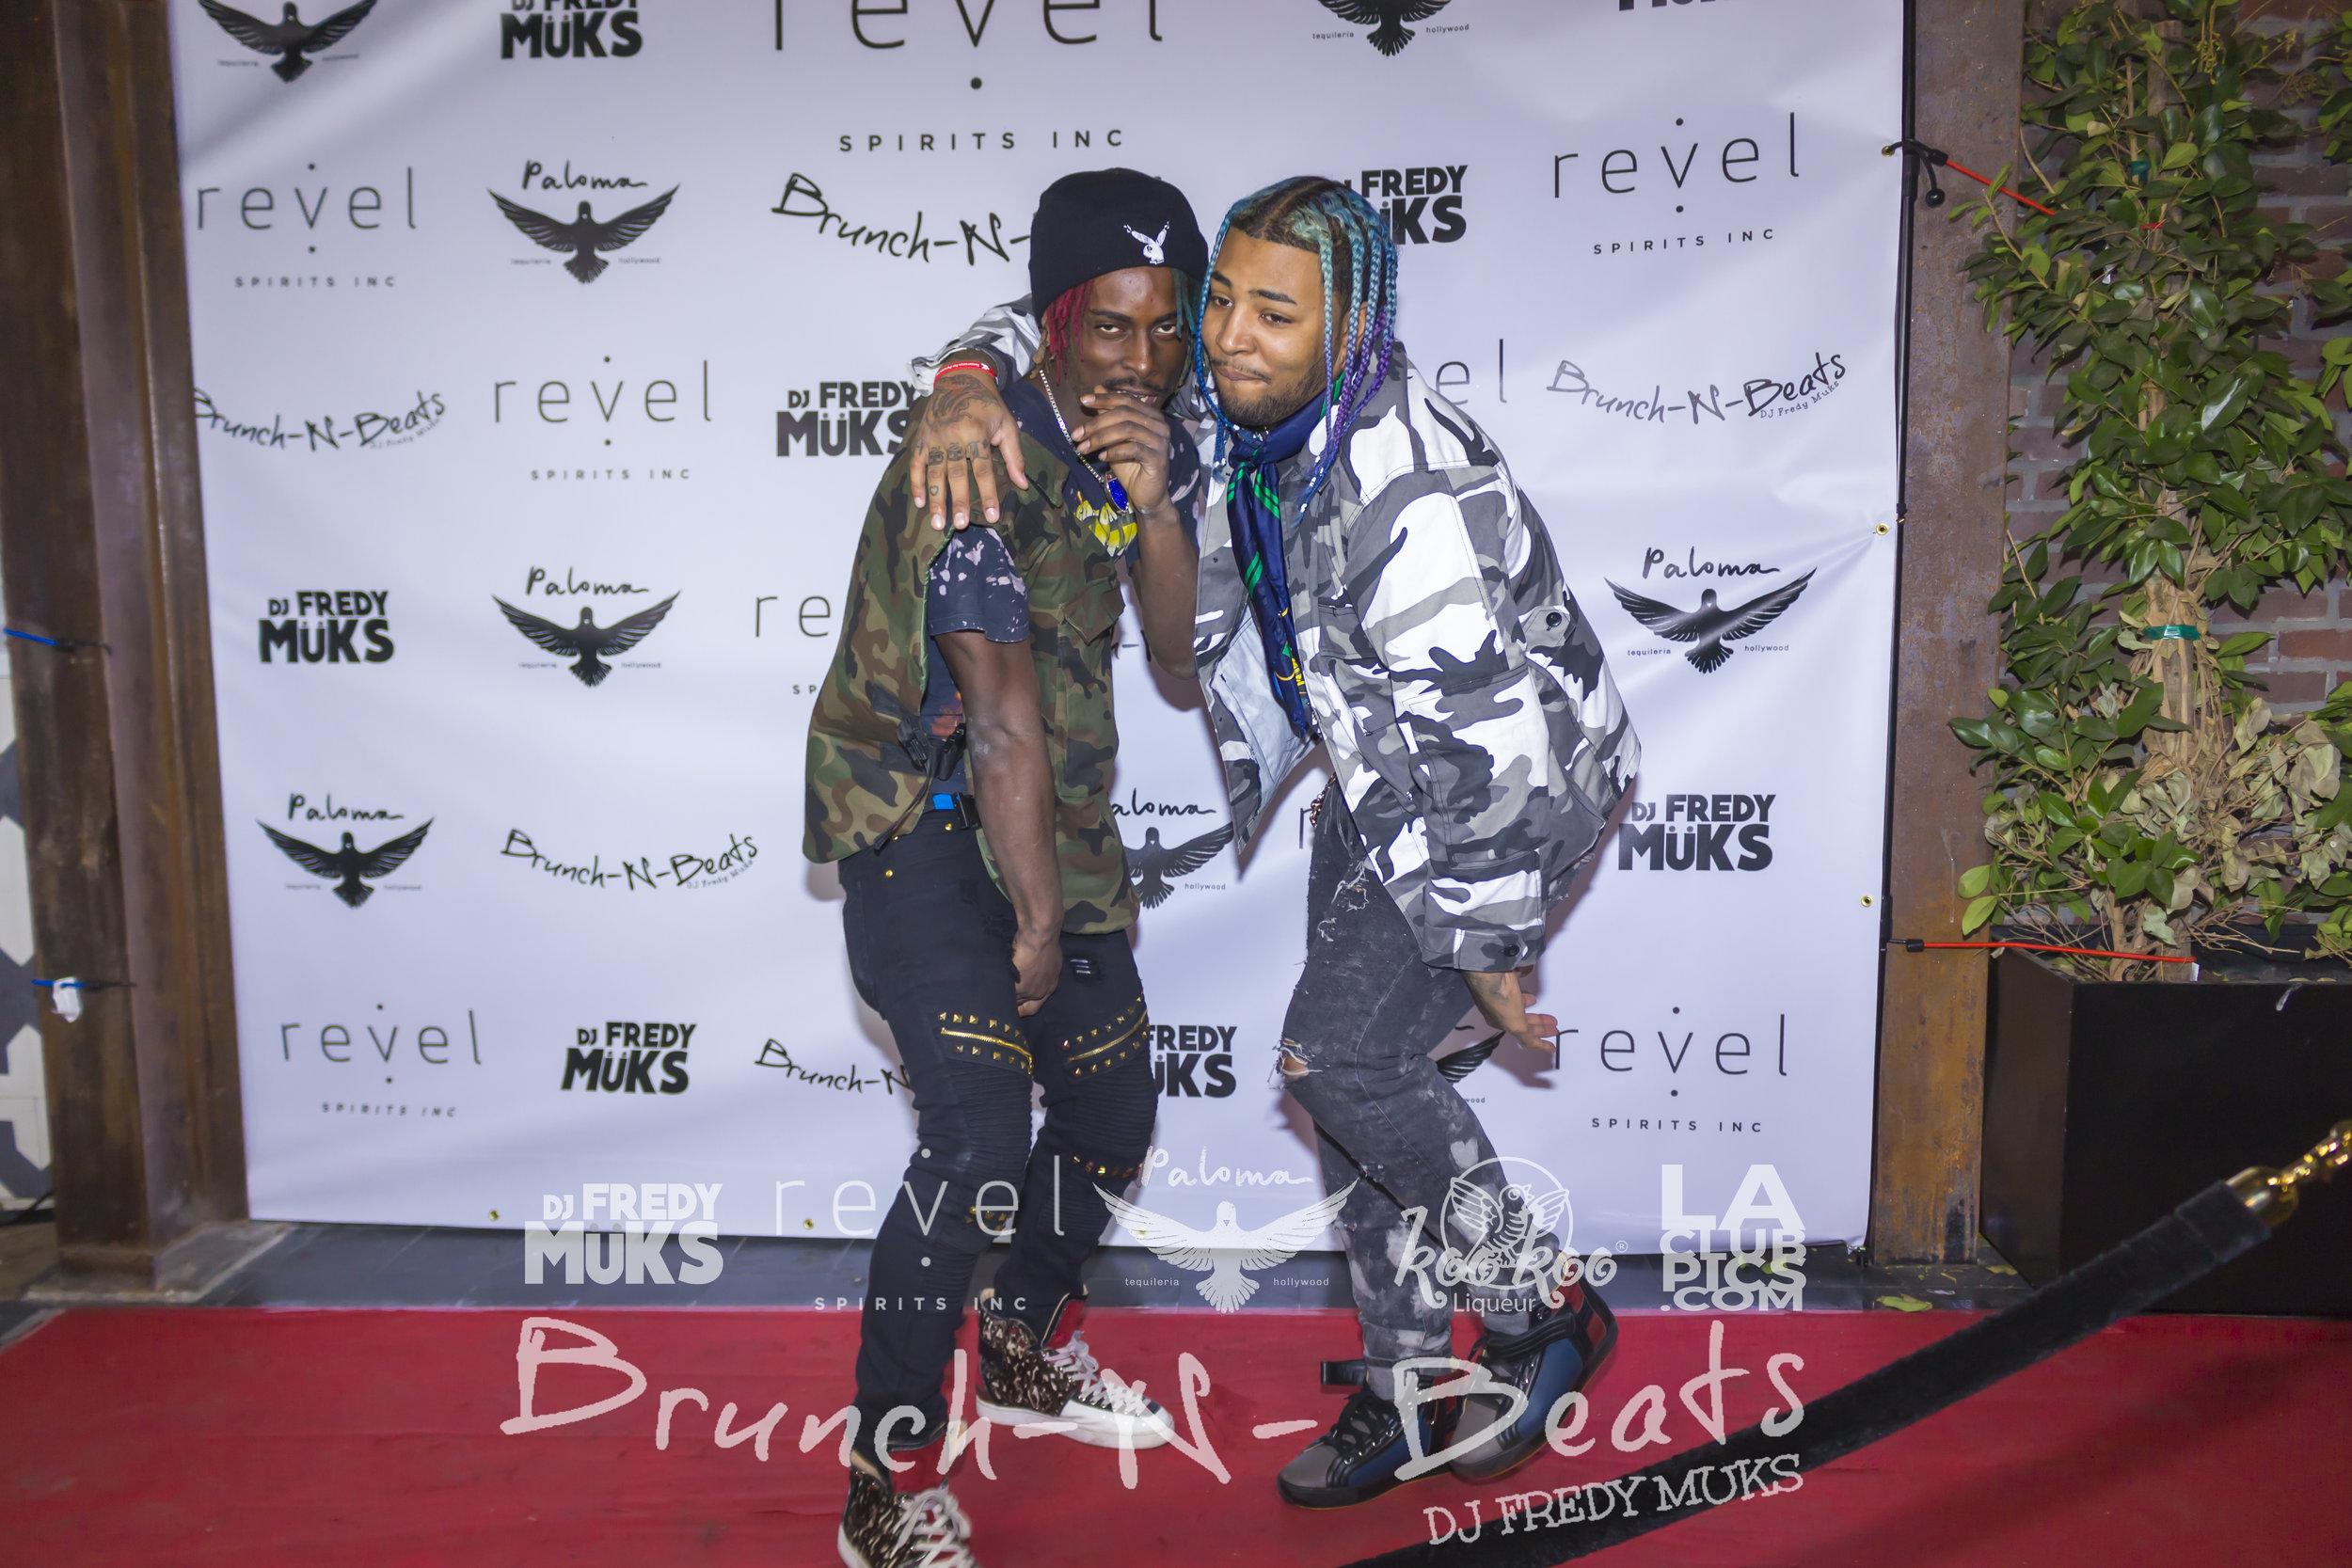 Brunch-N-Beats - Paloma Hollywood - 02-25-18_224.jpg